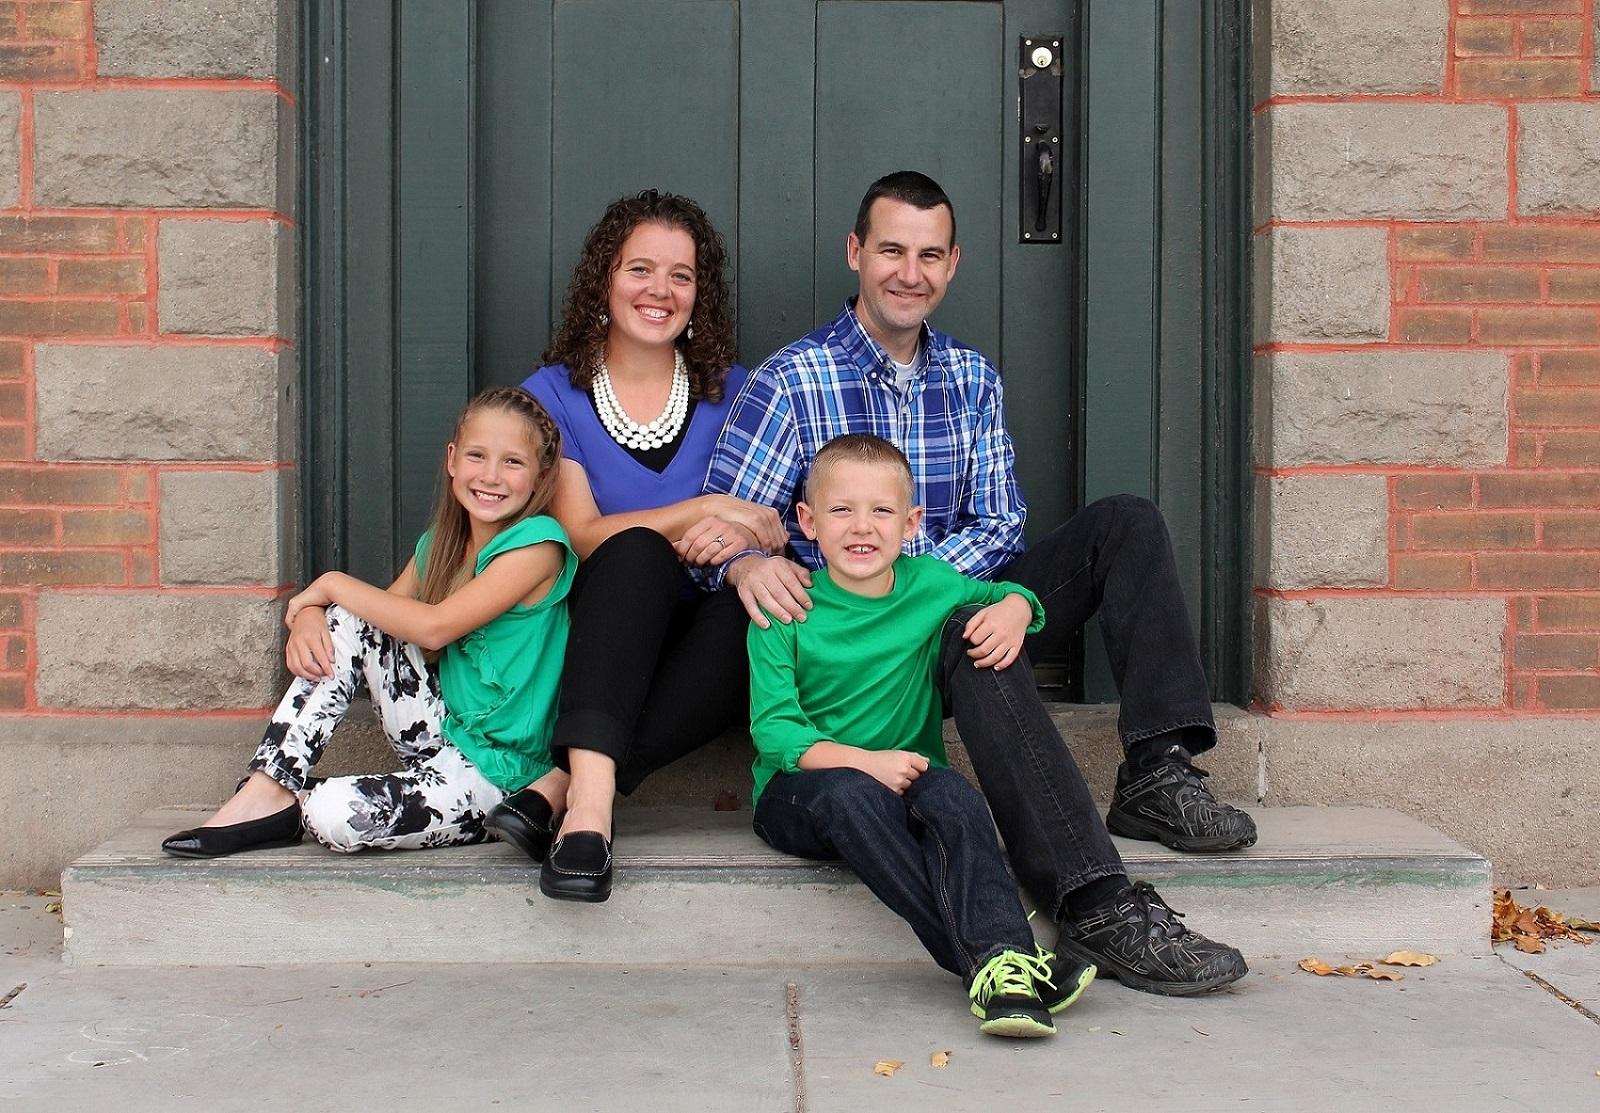 Family-Photo-B-small.jpg